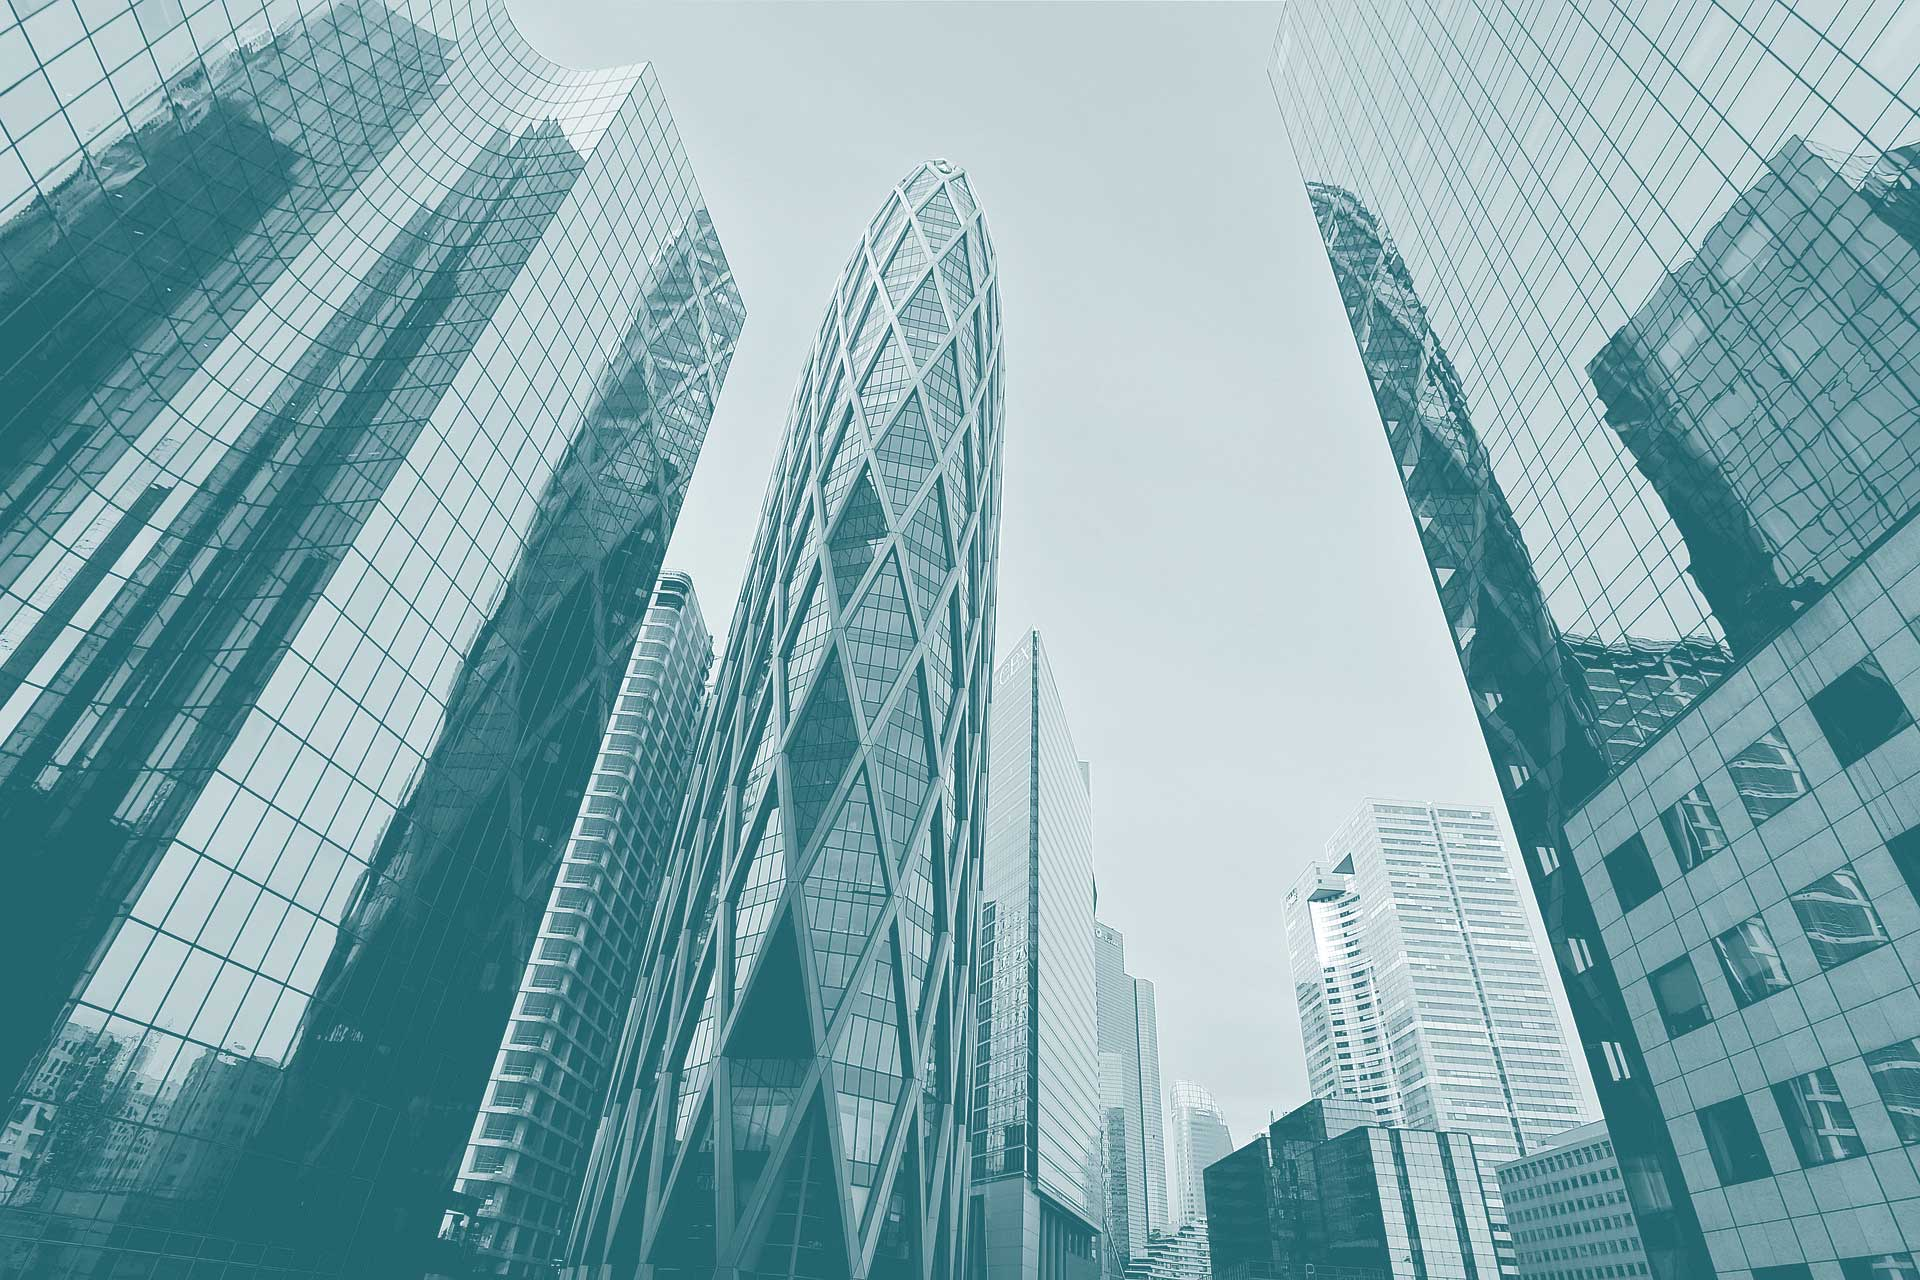 BGID-avocats-associes-droits-affaires-international-Paris-Delacarte-Itzkovitc-Bourgeois-corporate-business-associes-immobilier-creance-societe